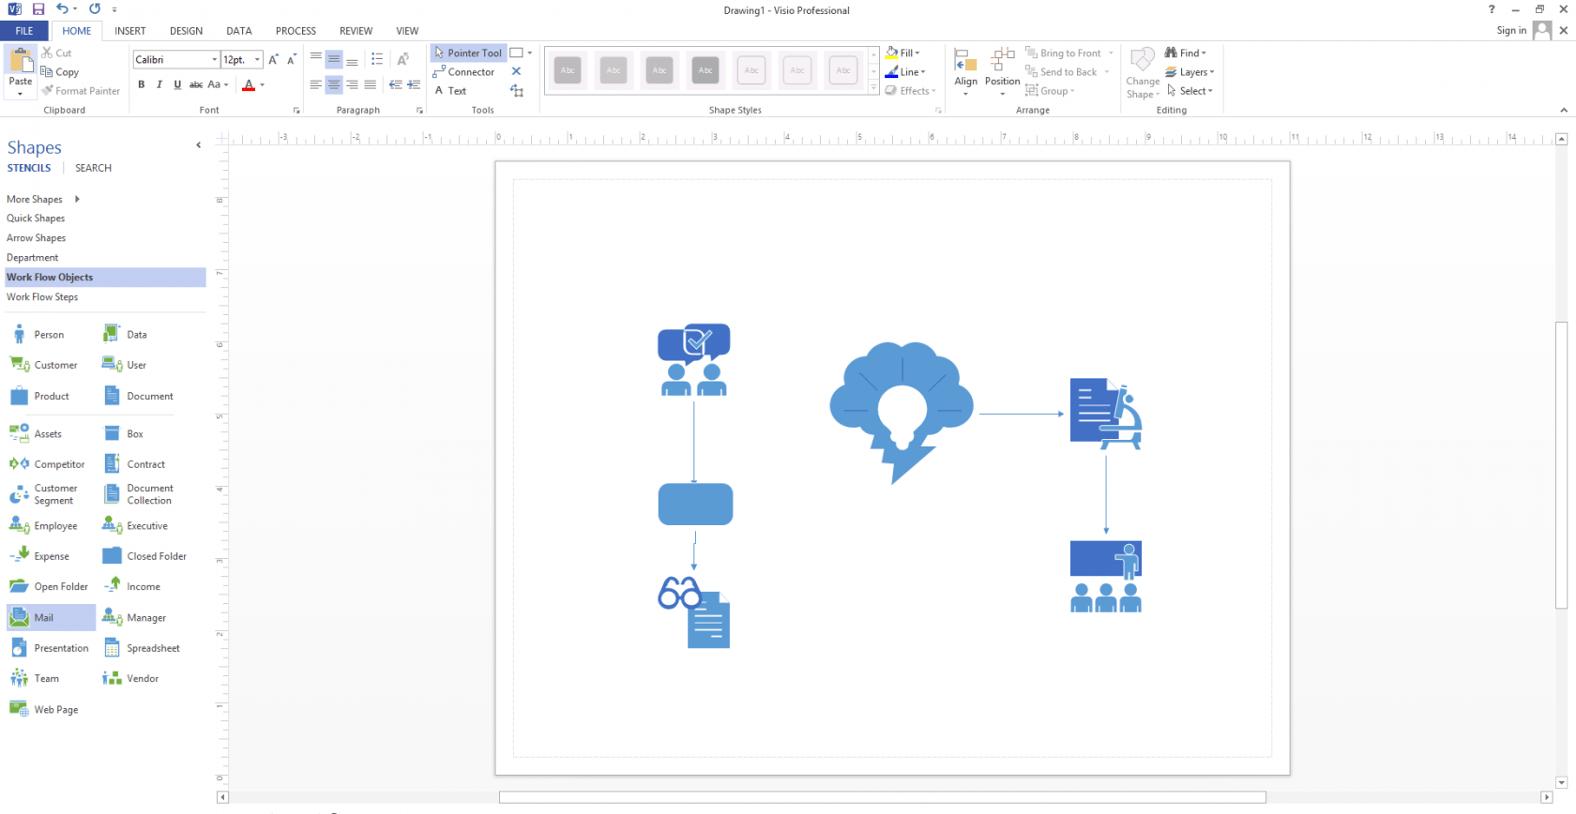 visio professional 2013 interface - Windows Visio 2013